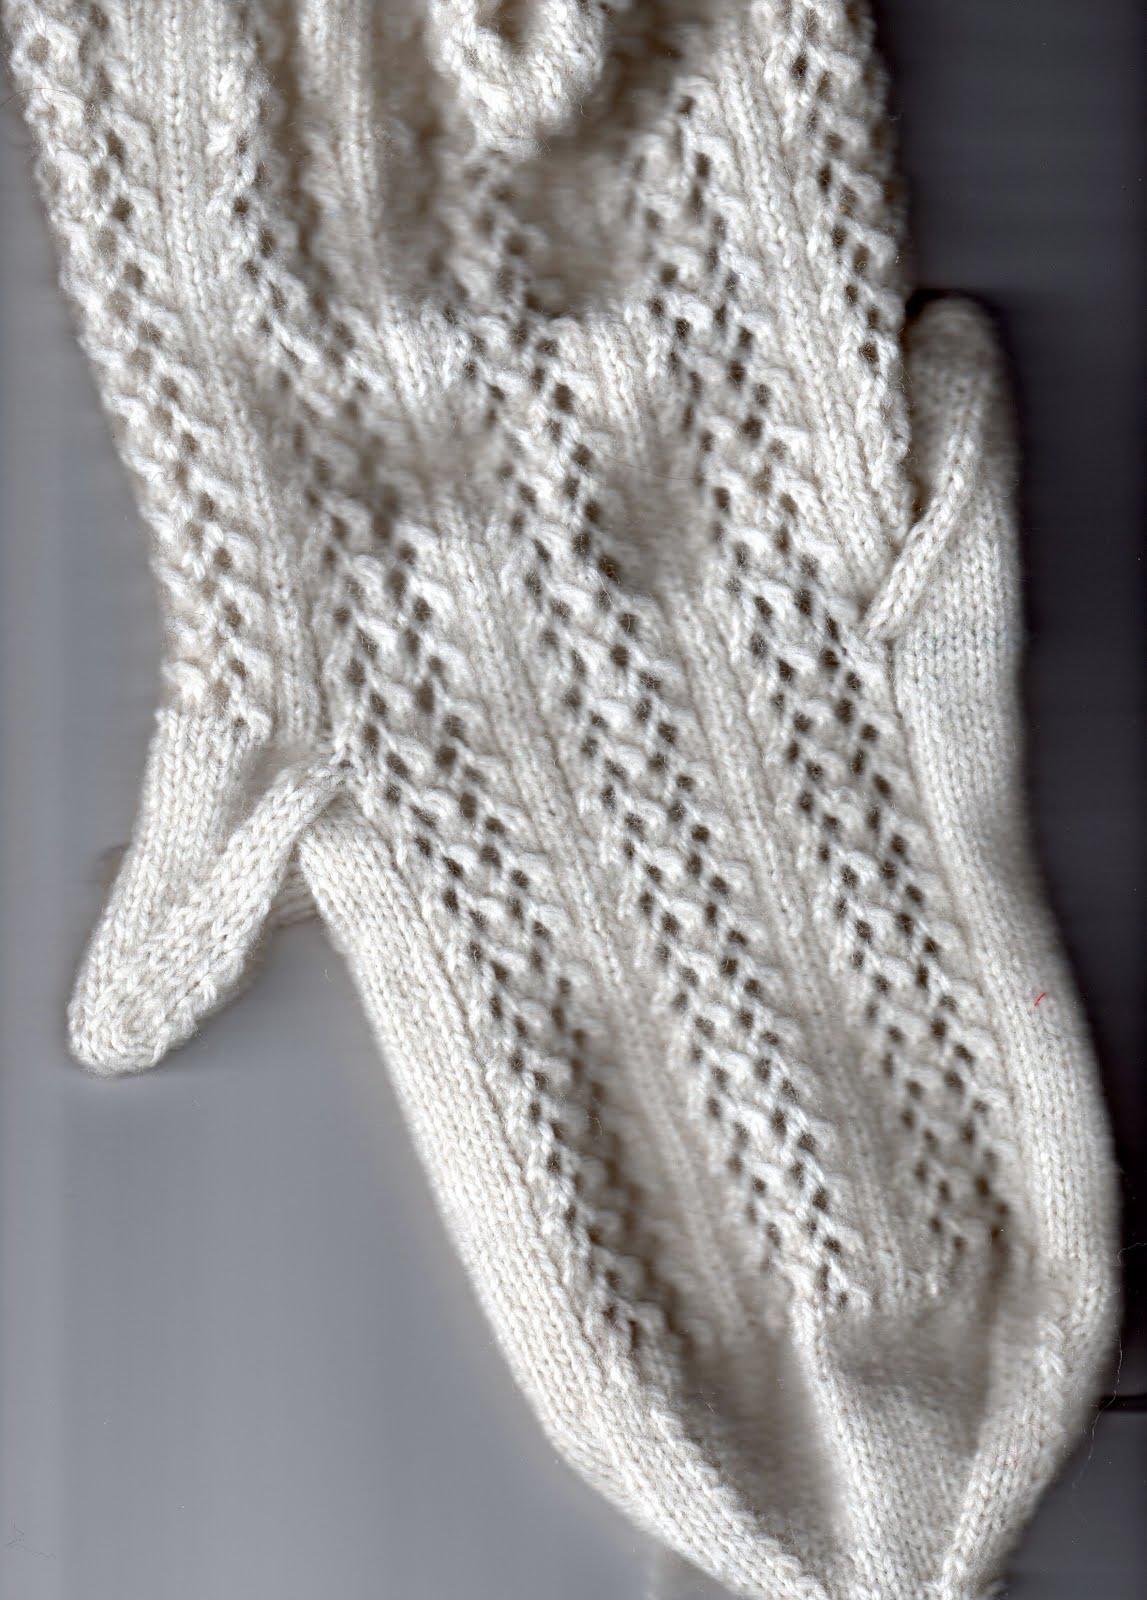 Crisis of Praxis: Vintage Thursday - Knee Socks